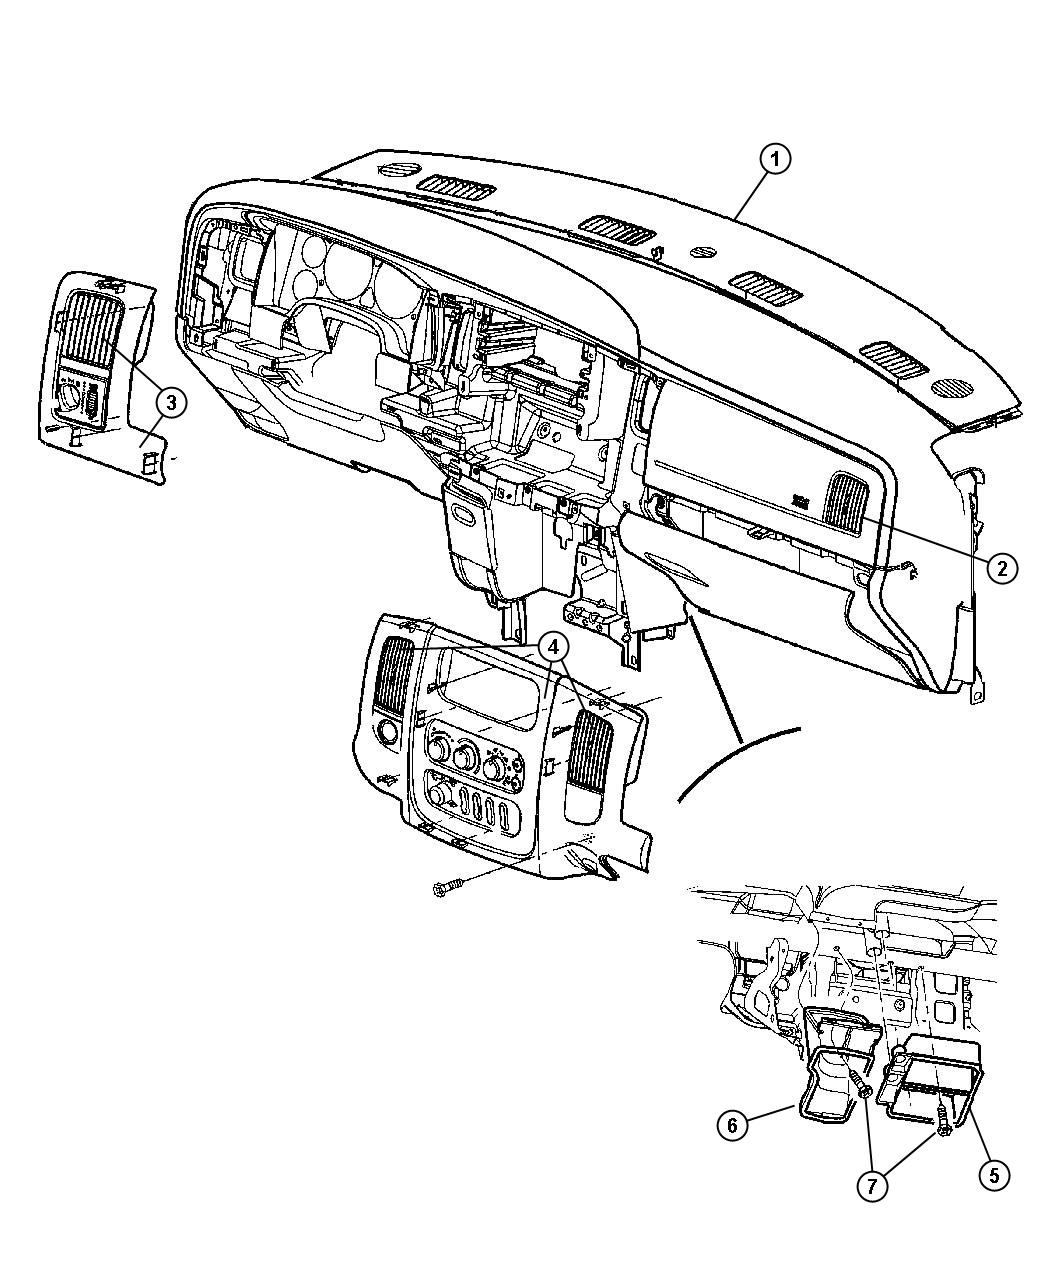 1998 Dodge Ram 2500 Bezel. Instrument panel. Center. Trim